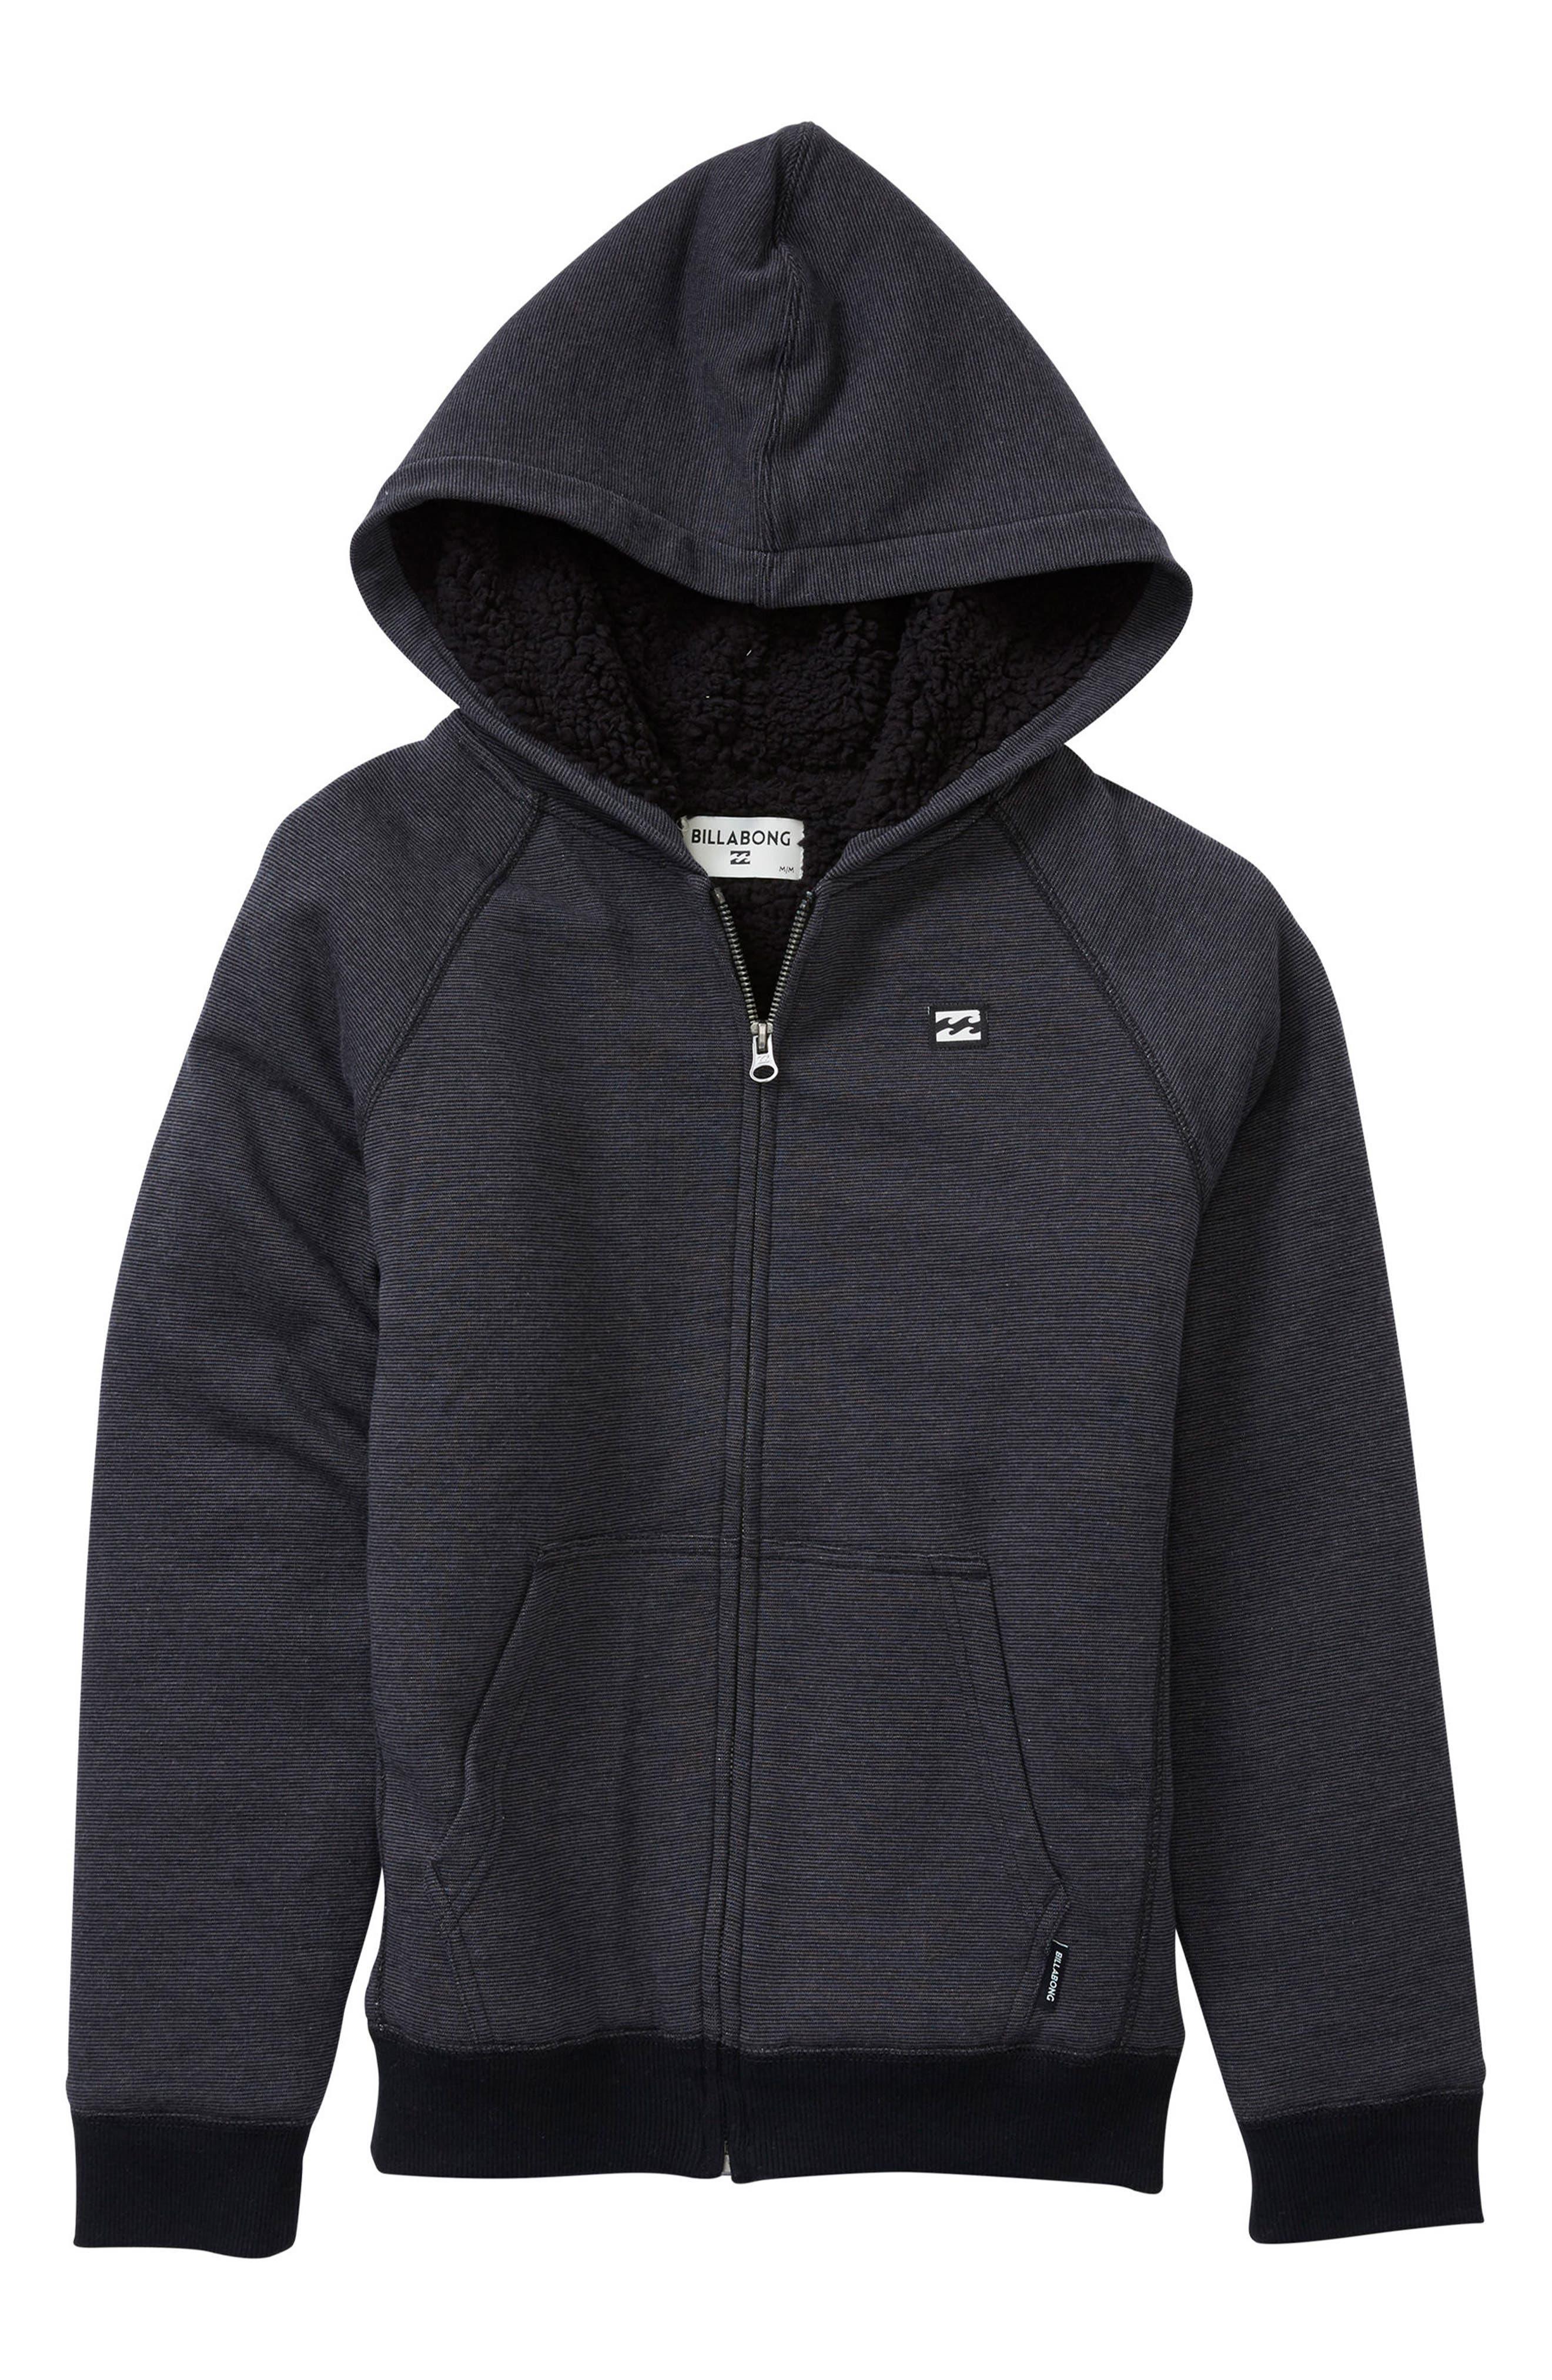 Balance Fleece Lined Zip Hoodie,                             Main thumbnail 1, color,                             Black Heather